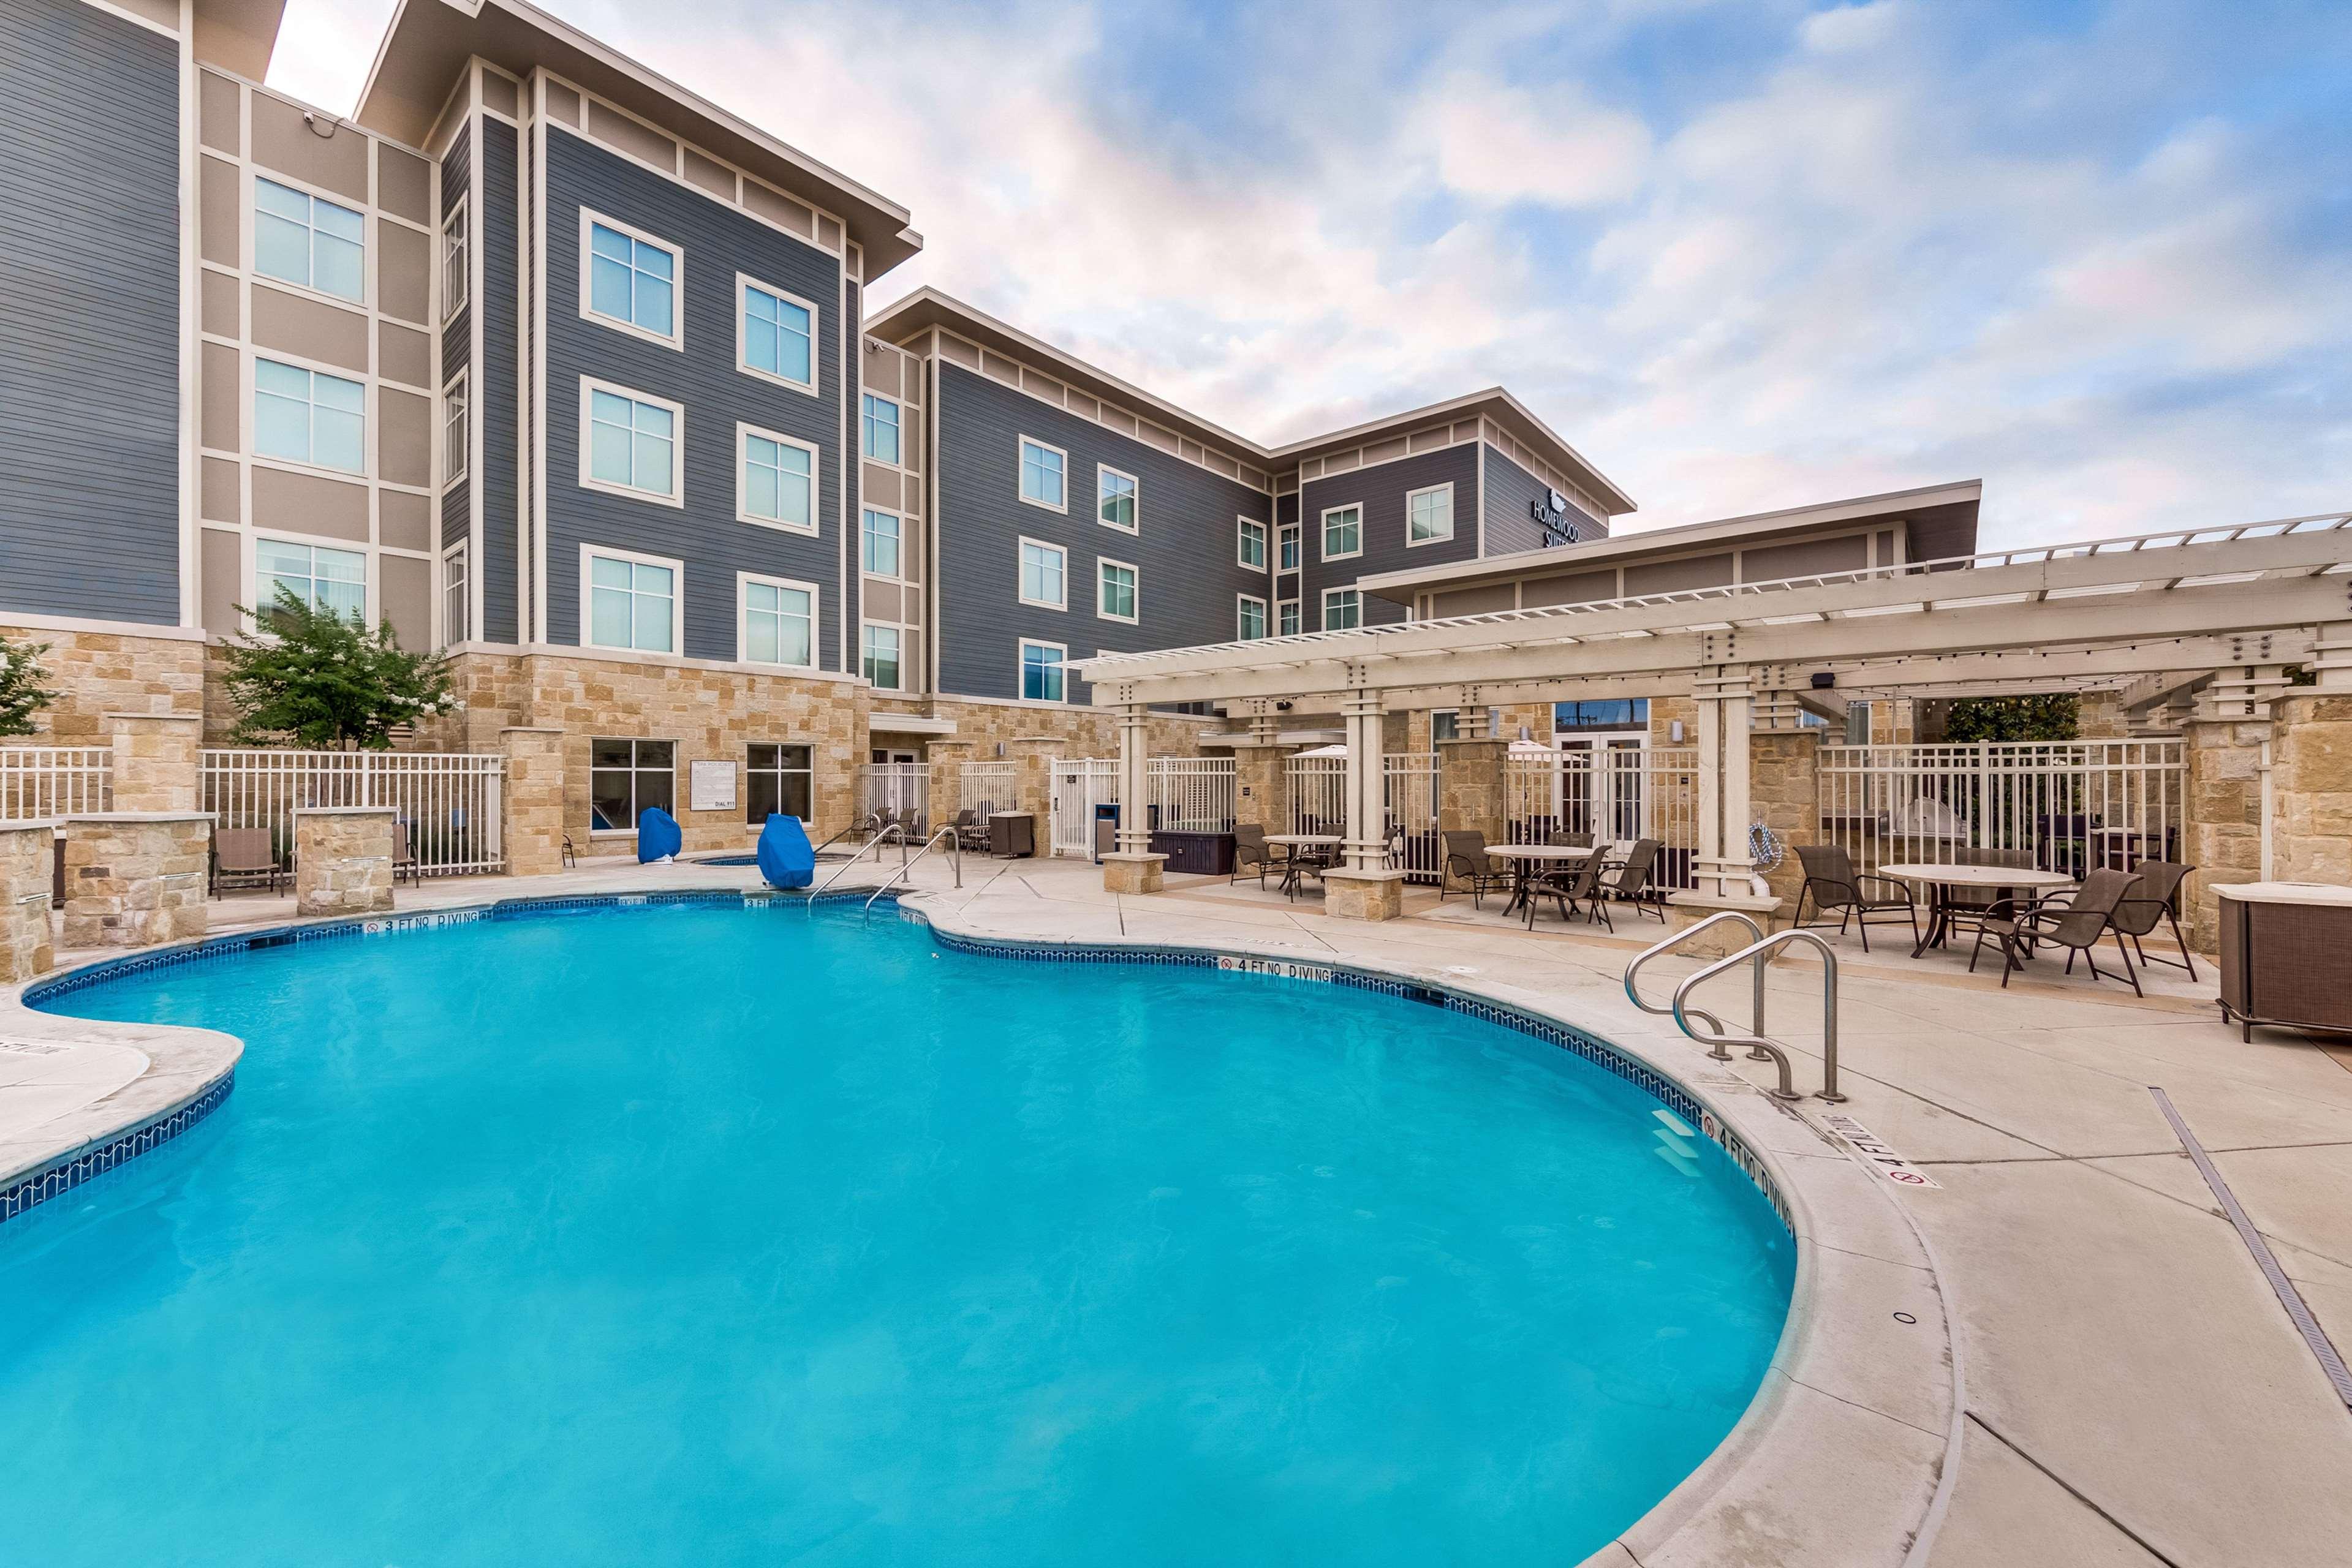 Homewood Suites by Hilton Fort Worth - Medical Center, TX image 4